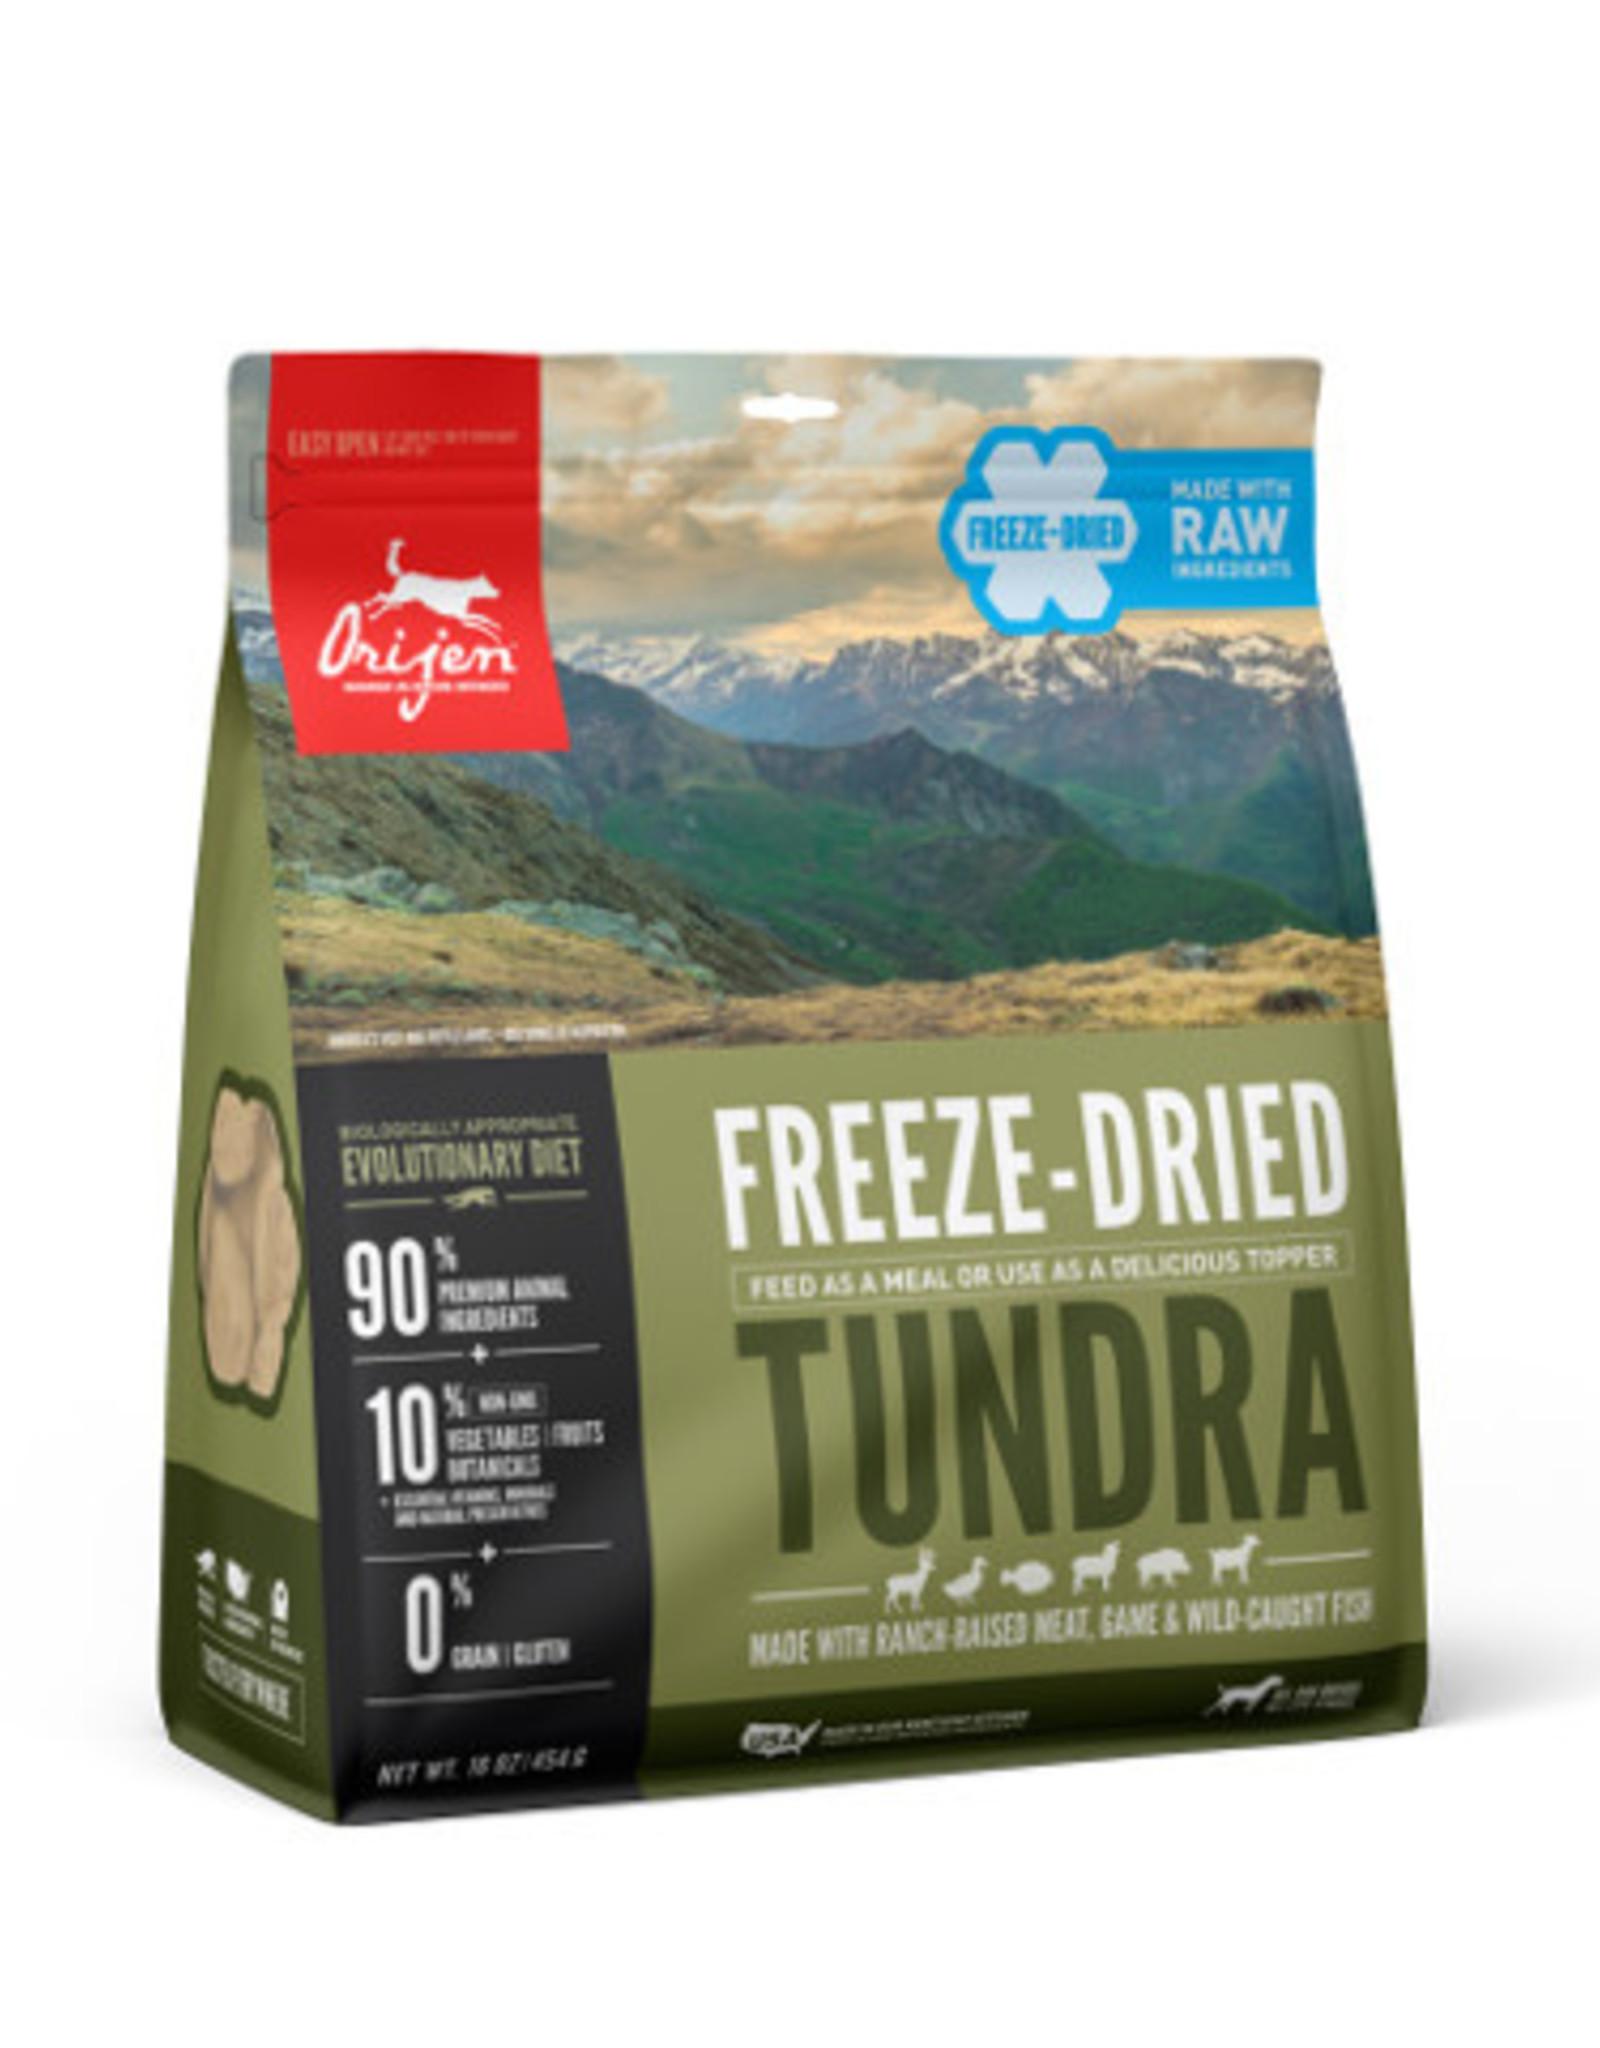 Orijen Orijen Dog Food Freeze Dried Tundra